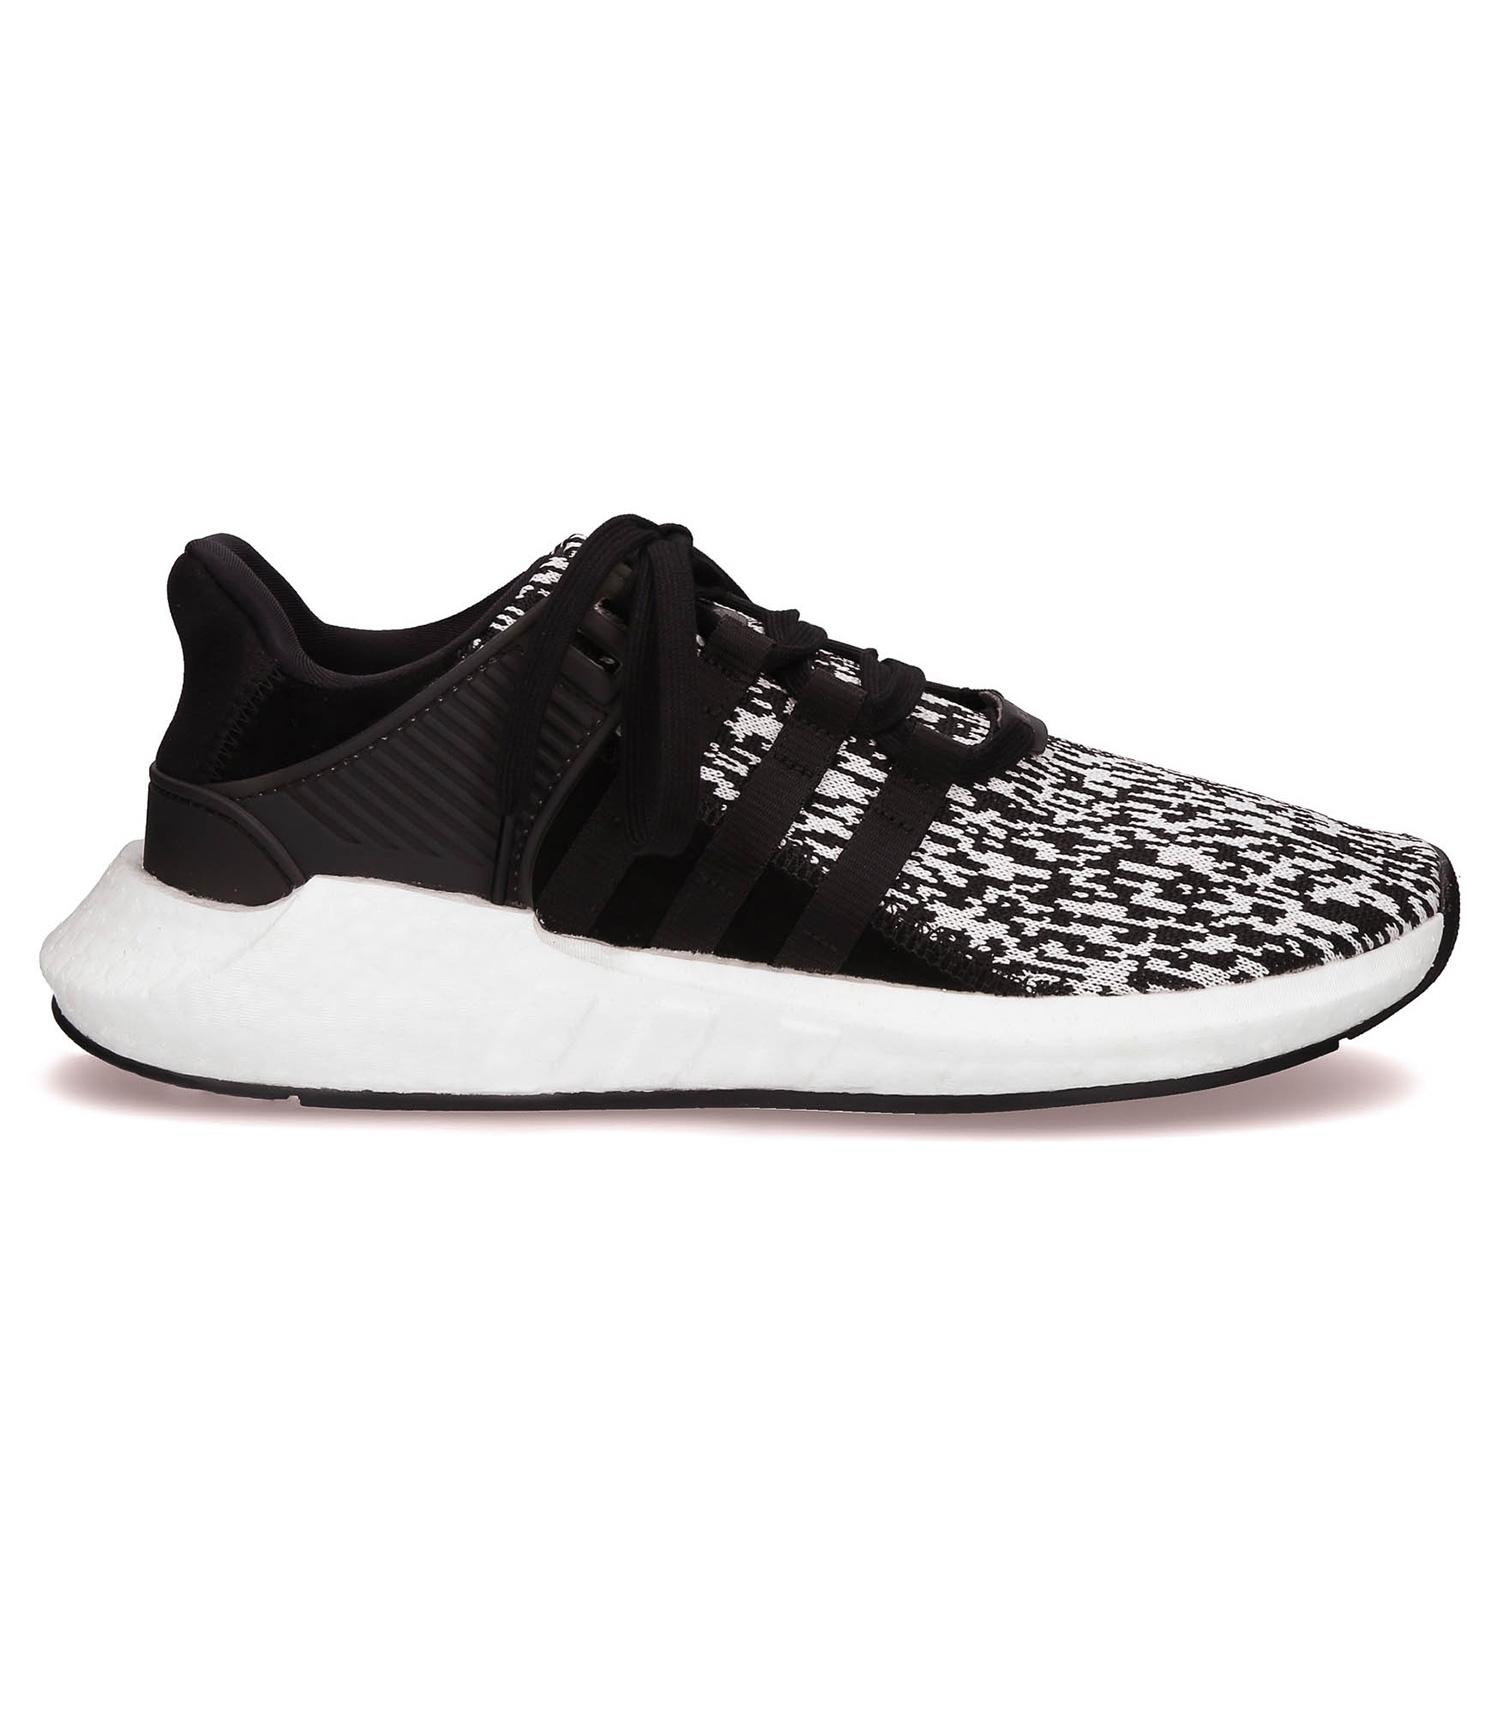 Sneakers EQT Support 93/17 Noir/Blanc adidas Originals - Jane de Boy